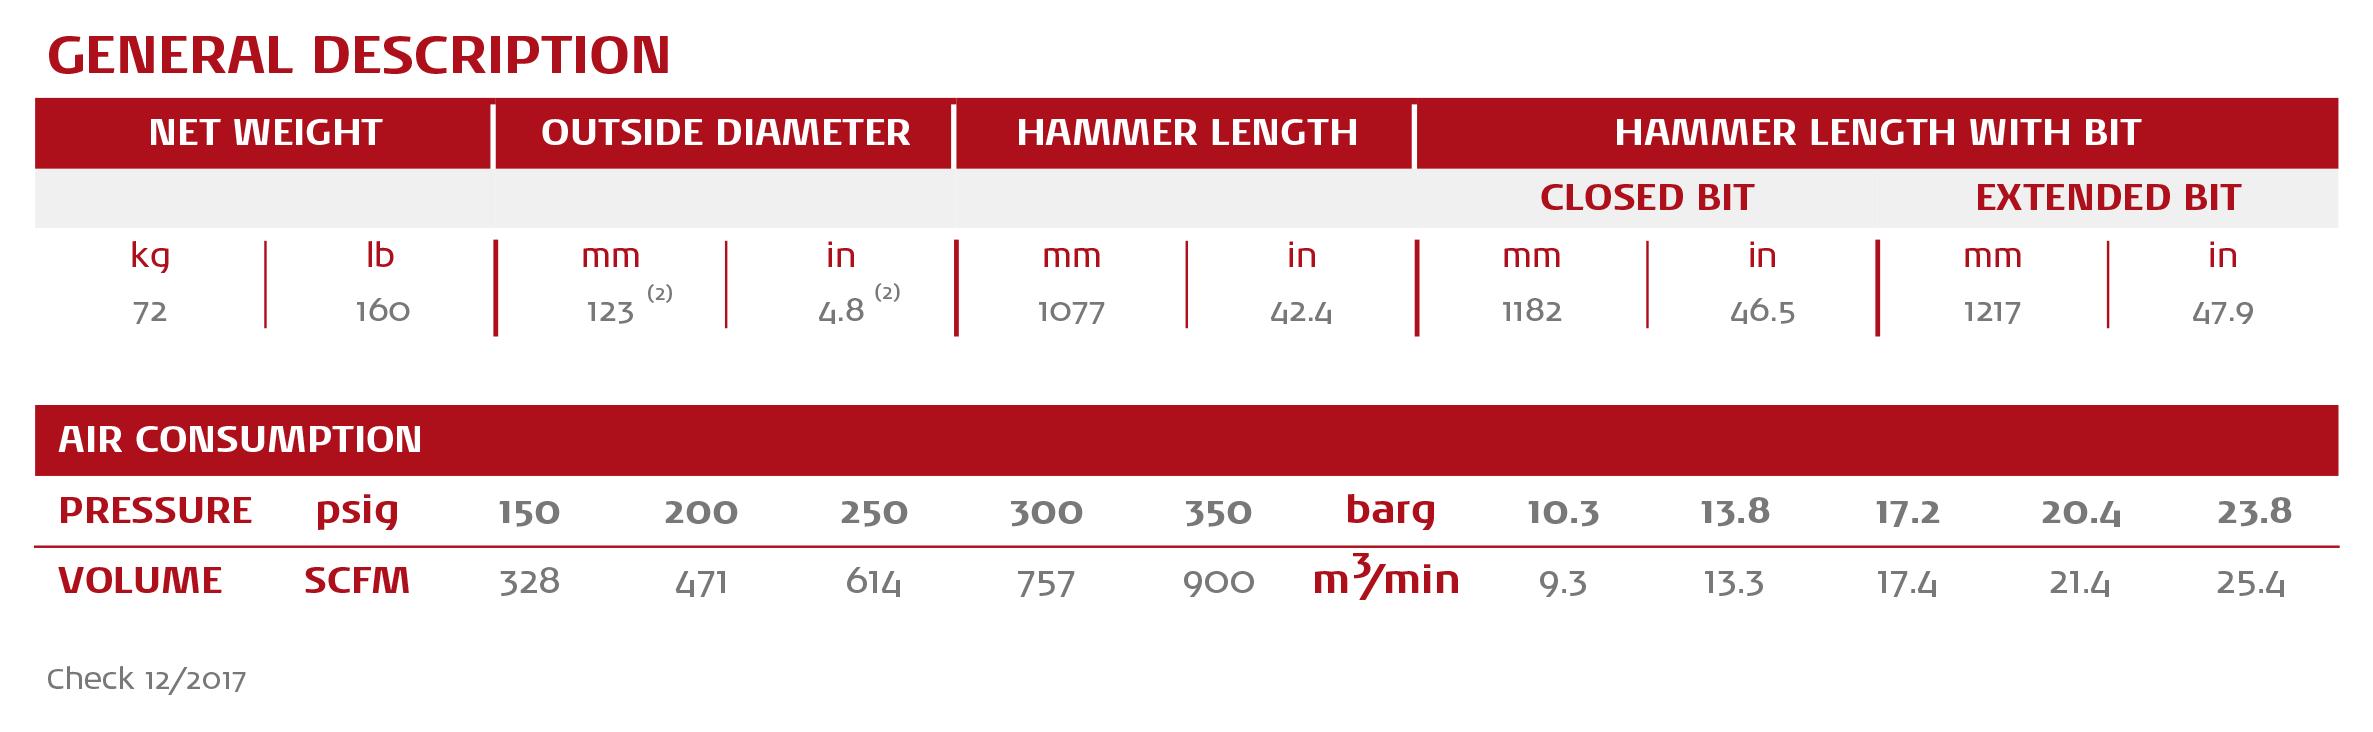 Puma M5.2EX HV HDR 3 BECO General Description